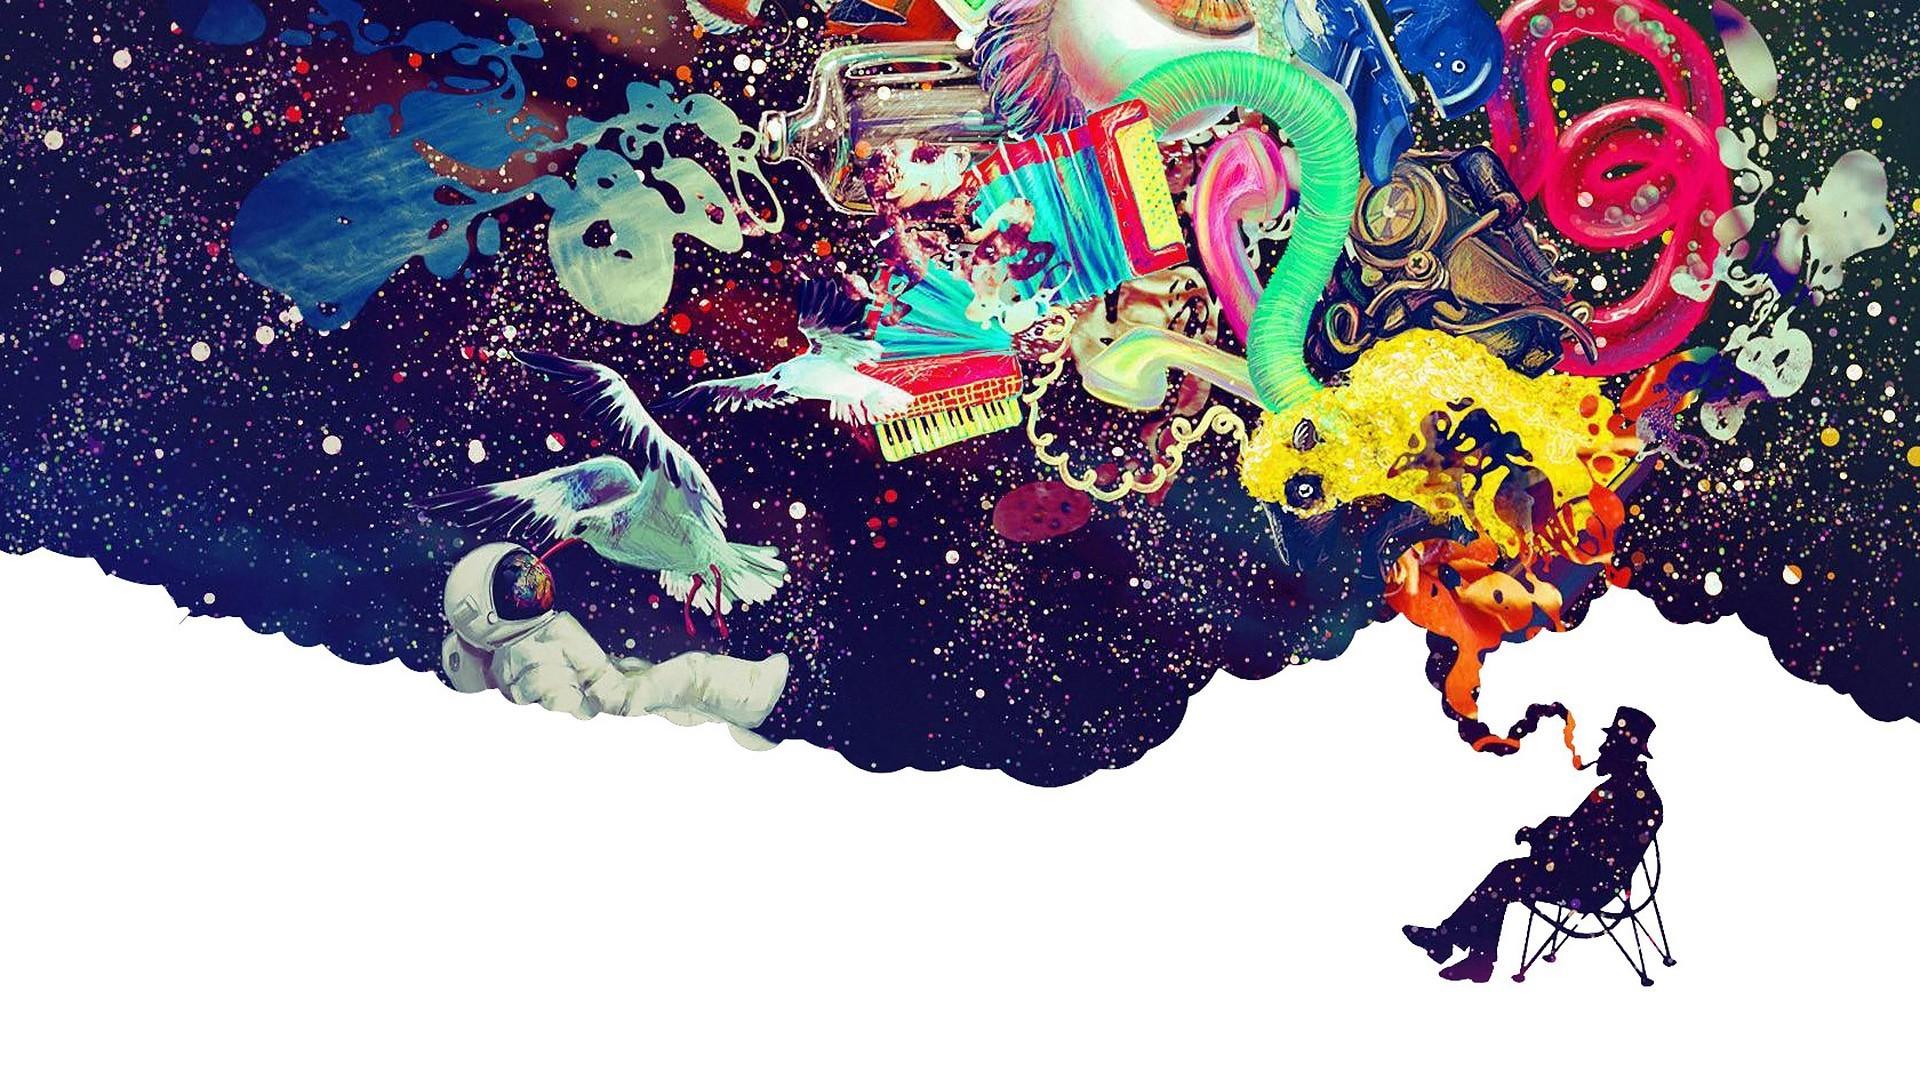 Wallpaper Illustration Digital Art Abstract Space